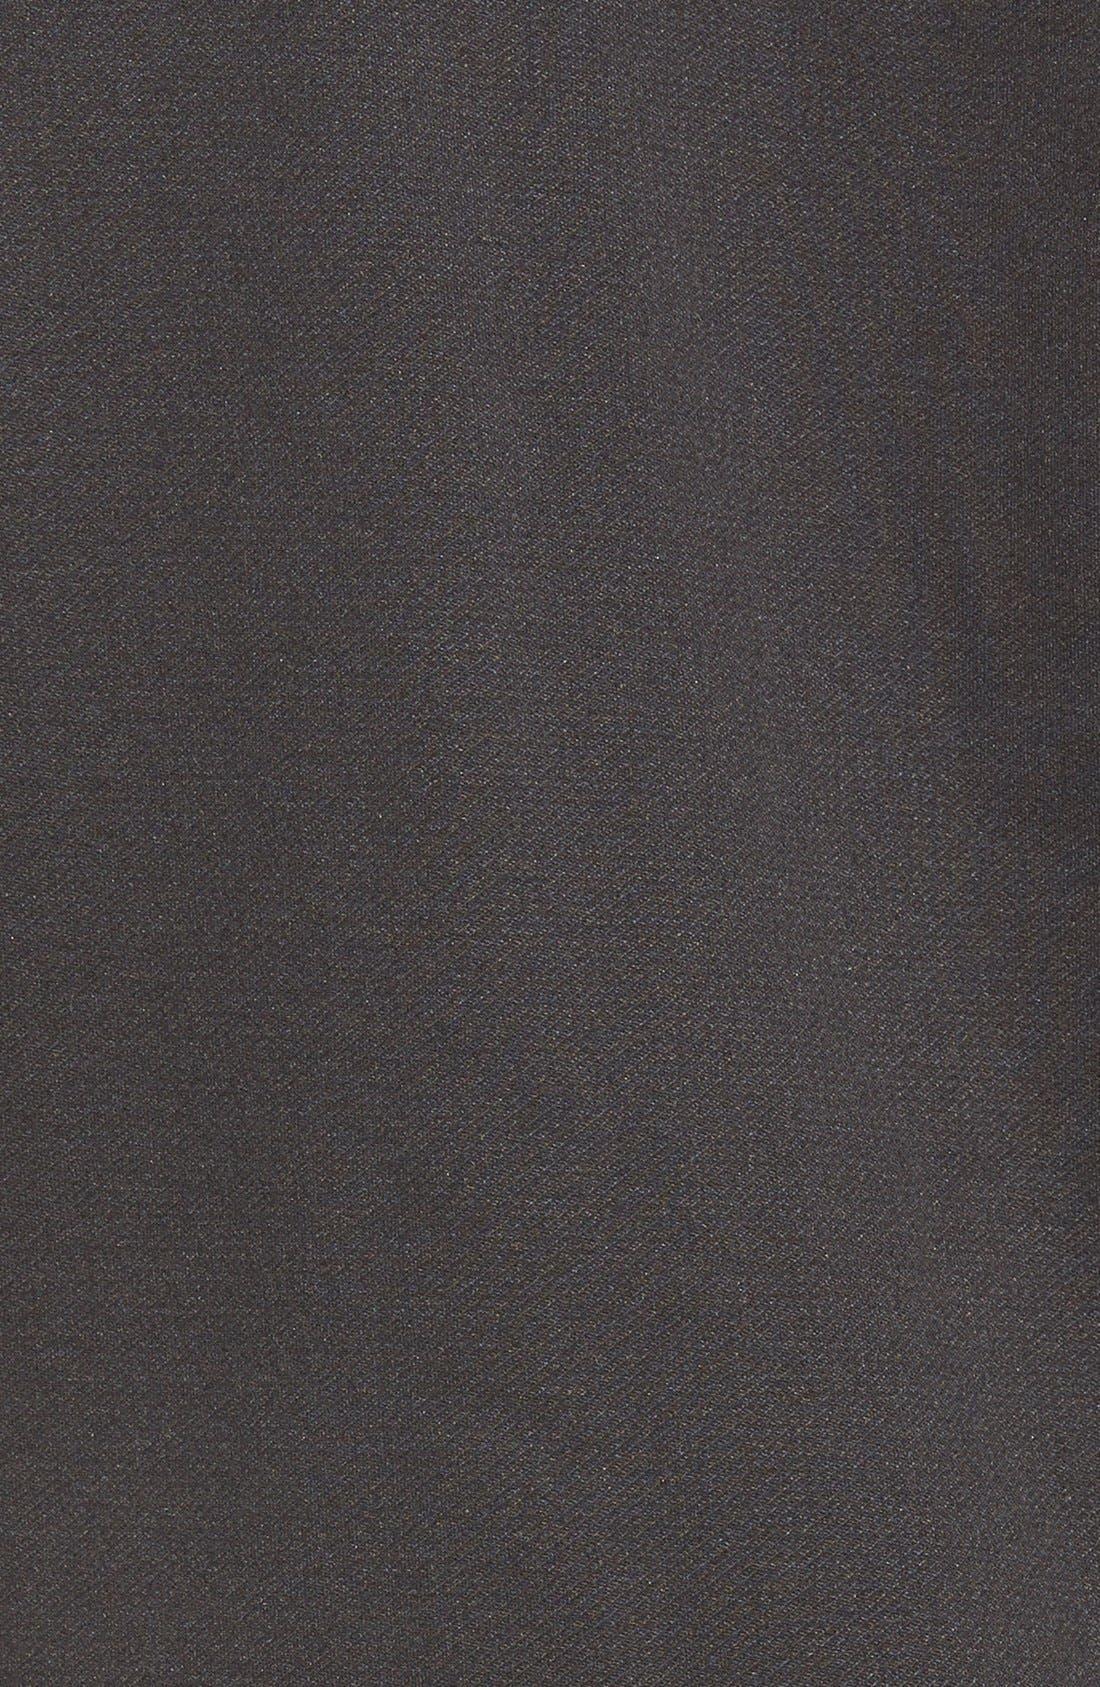 'Straibo' Midweight Technical Fleece Jacket,                             Alternate thumbnail 2, color,                             001